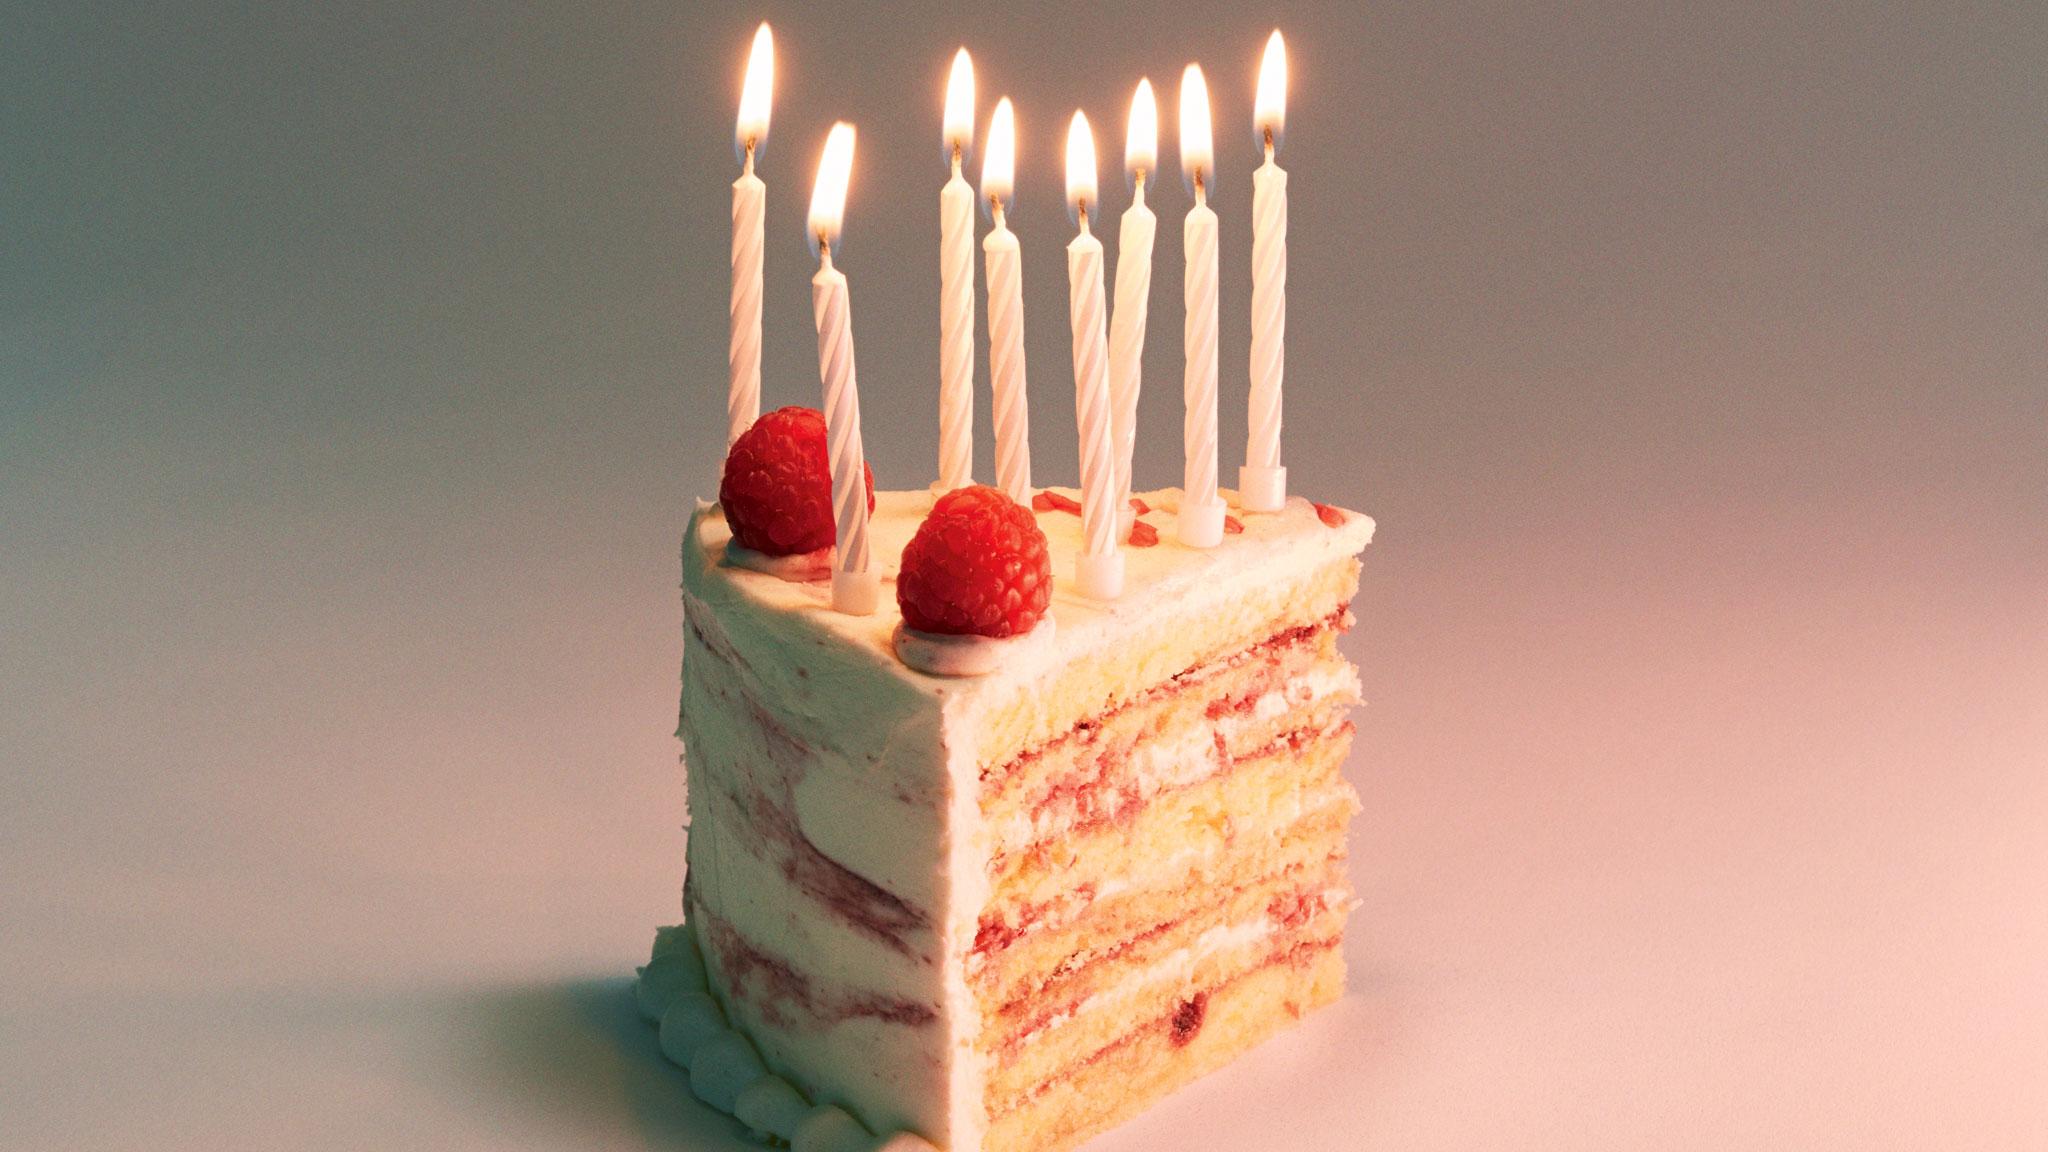 The Taste Test Birthday Cakes Financial Times